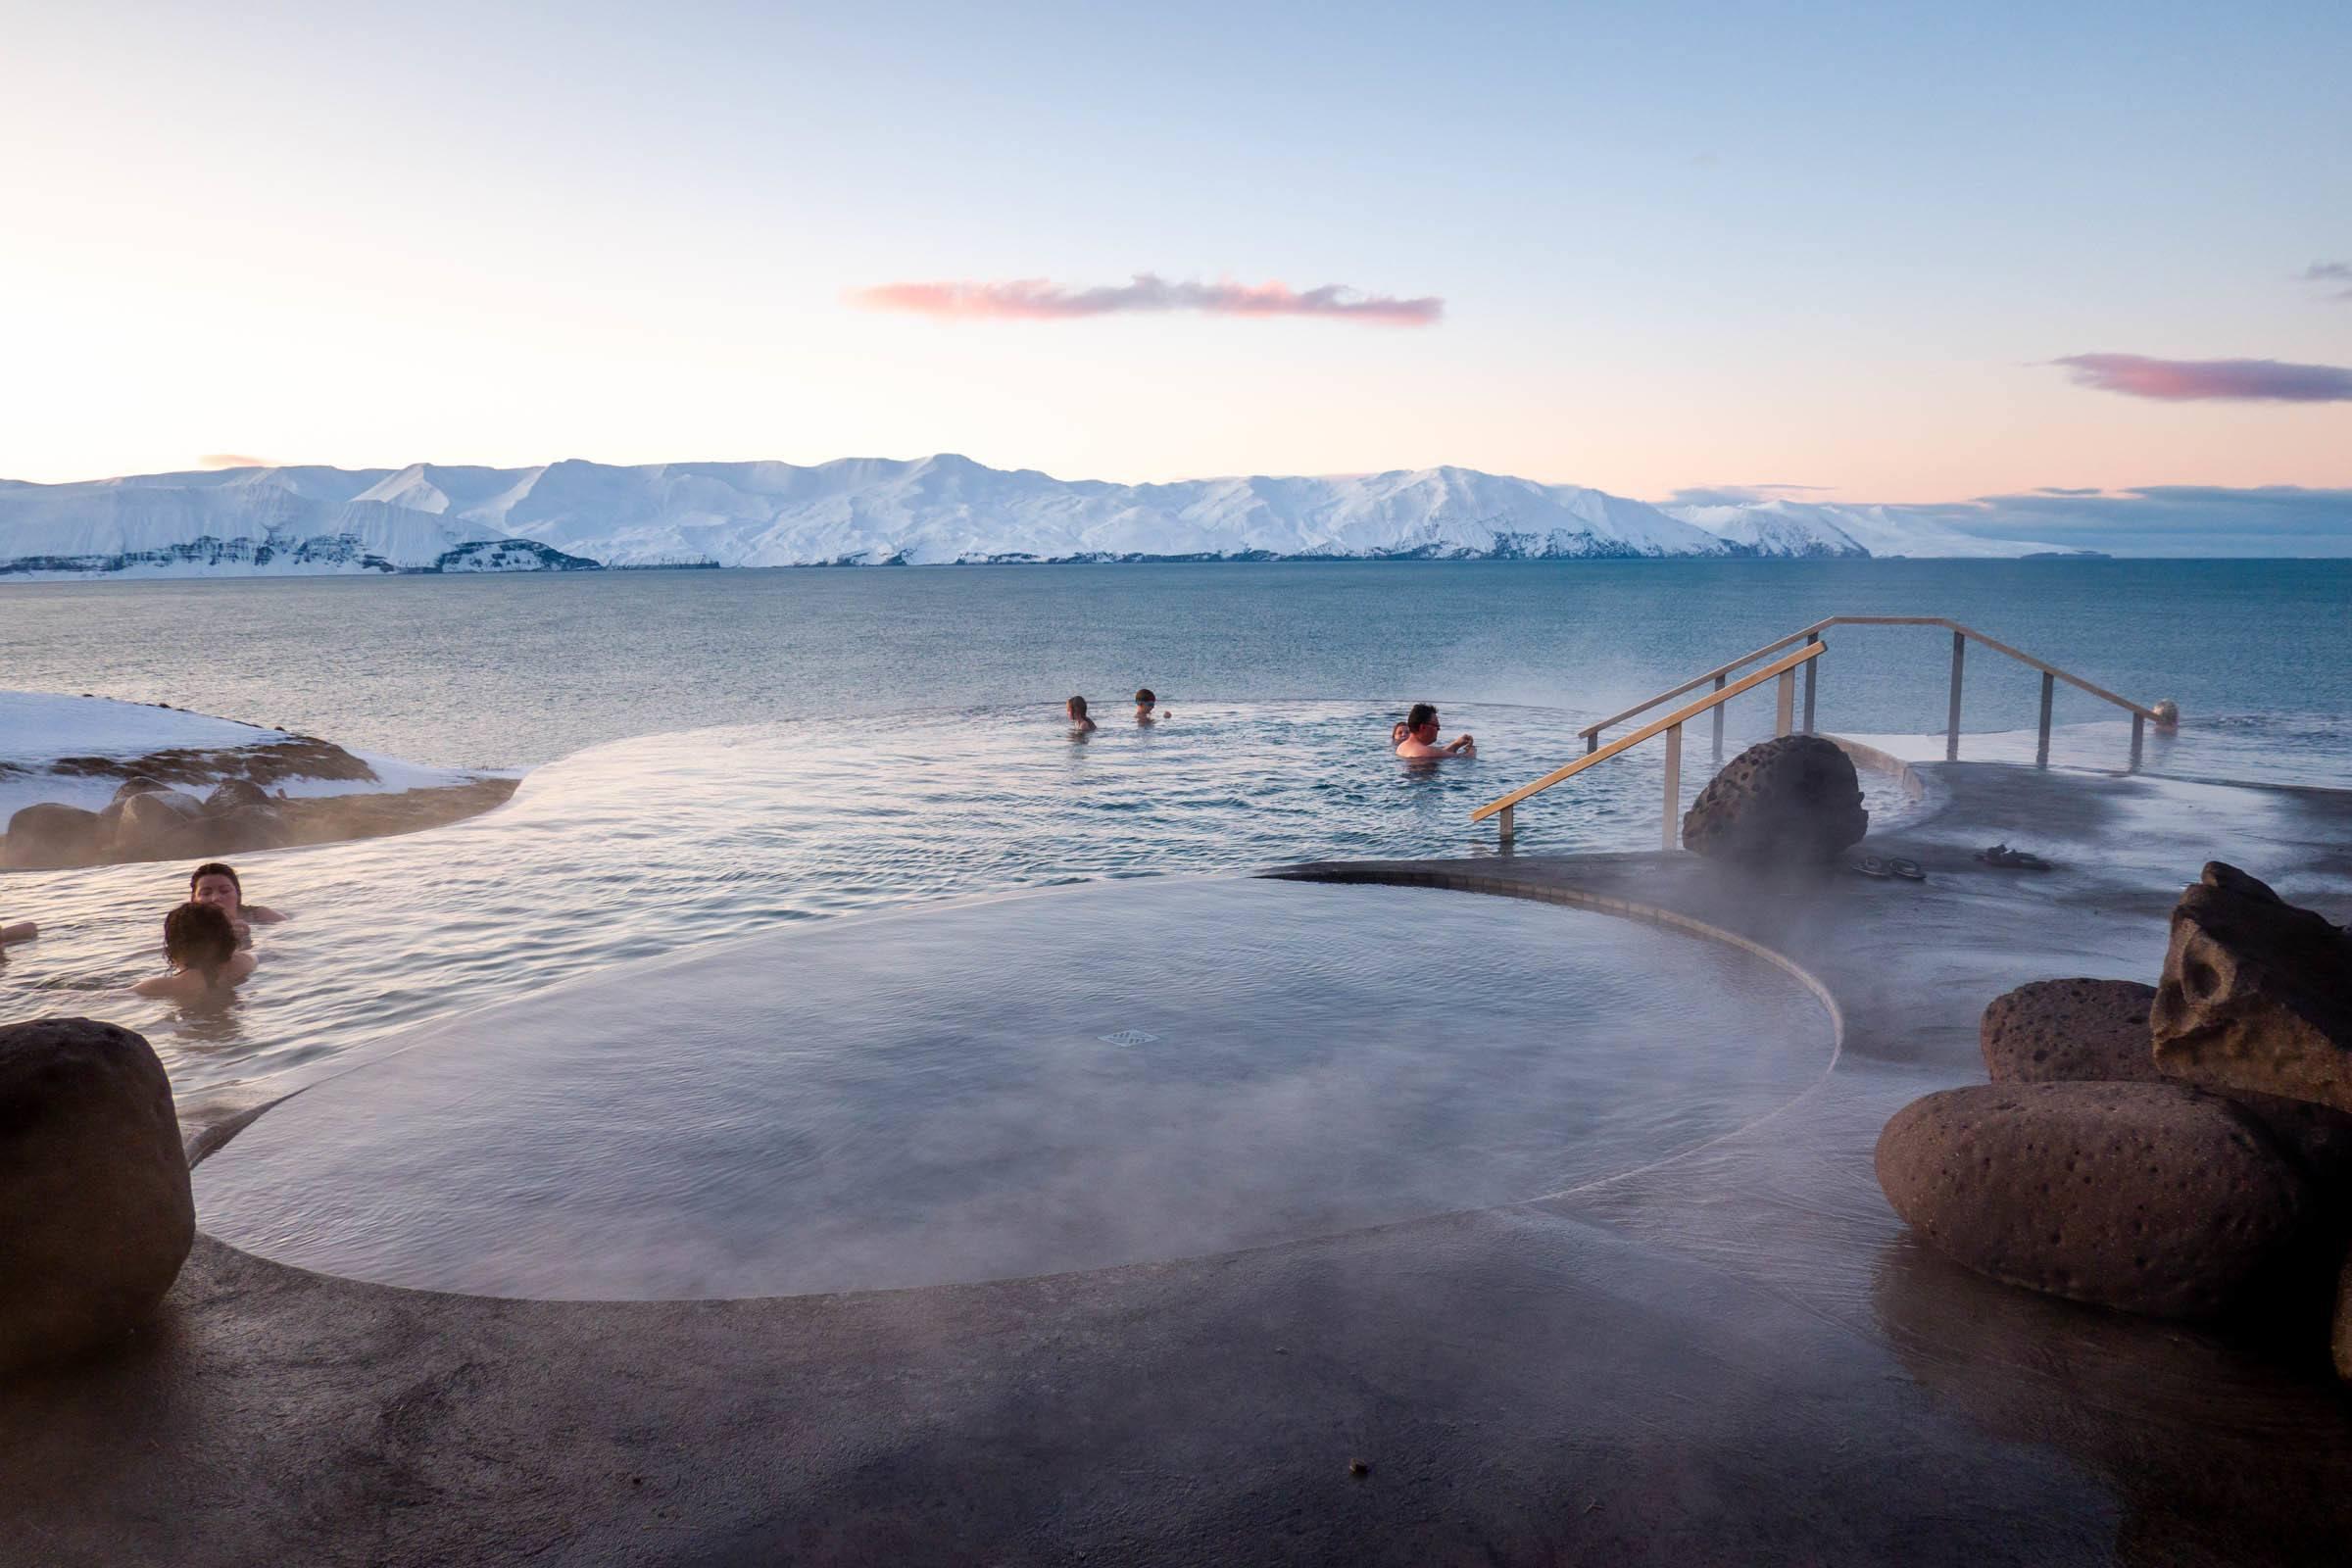 The infinity pools of the GeoSea Thermal Baths in Husavik